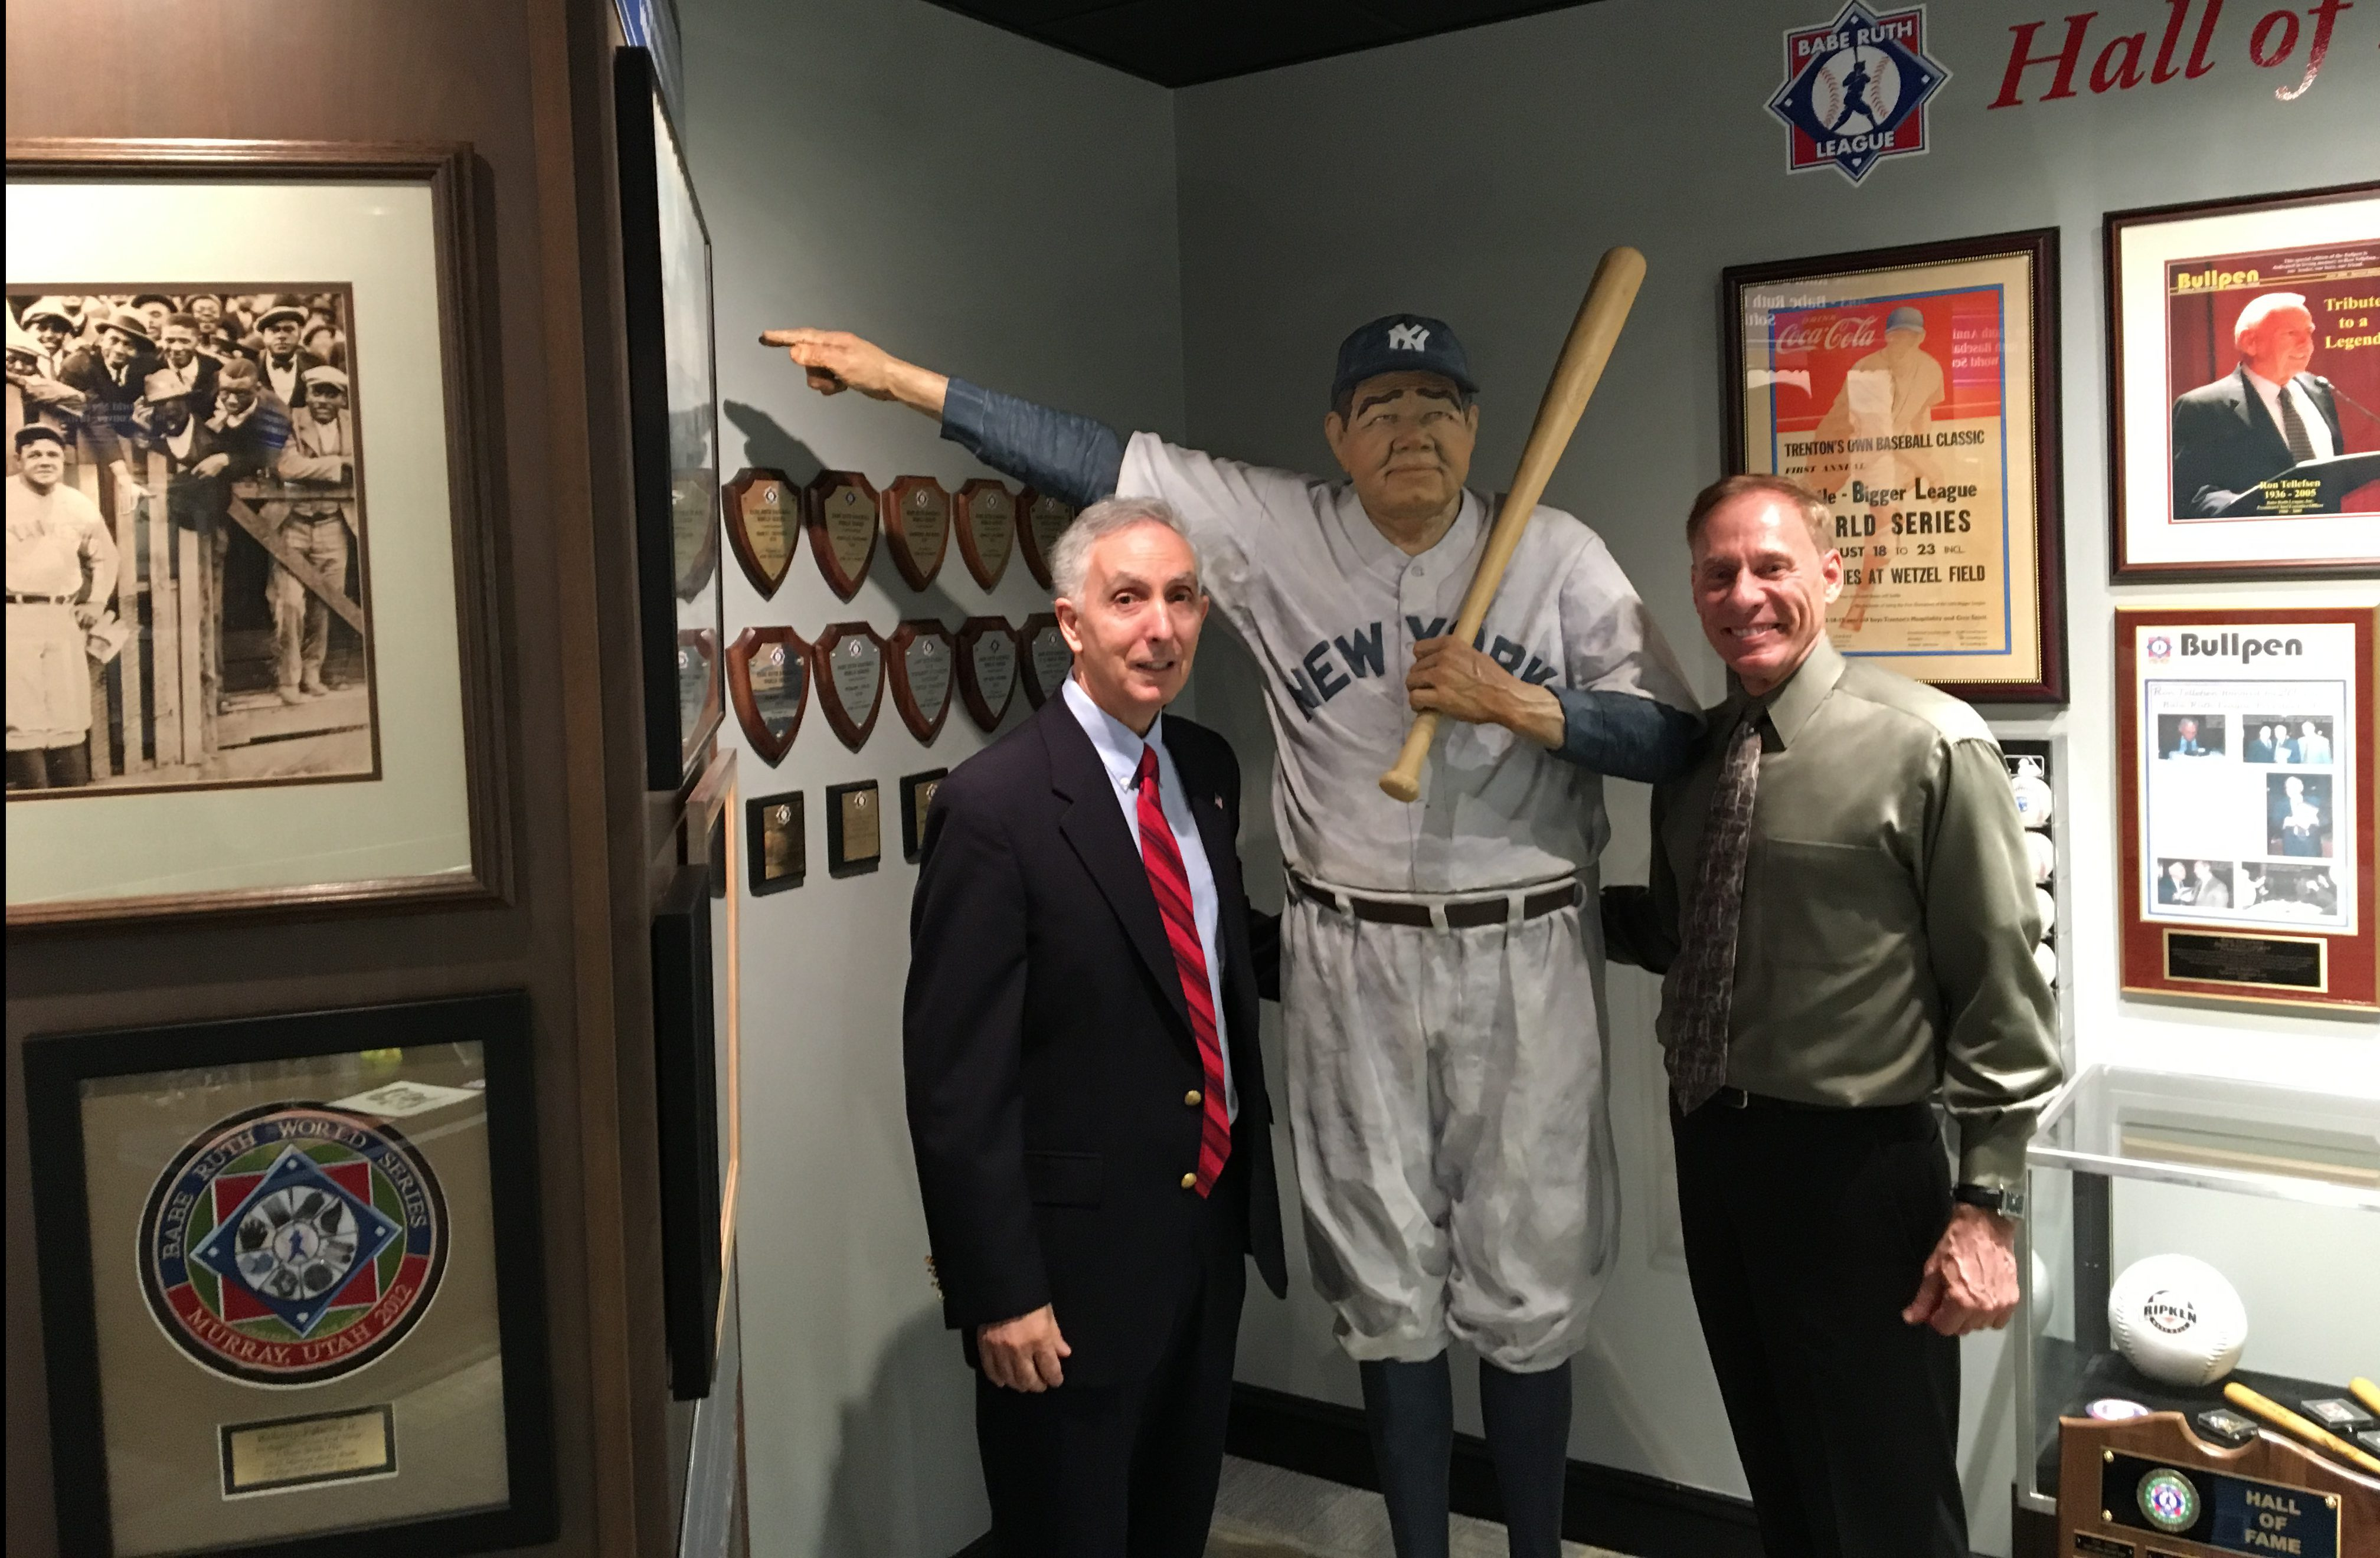 Babe Ruth League, Steven TellefsenPresident/CEO